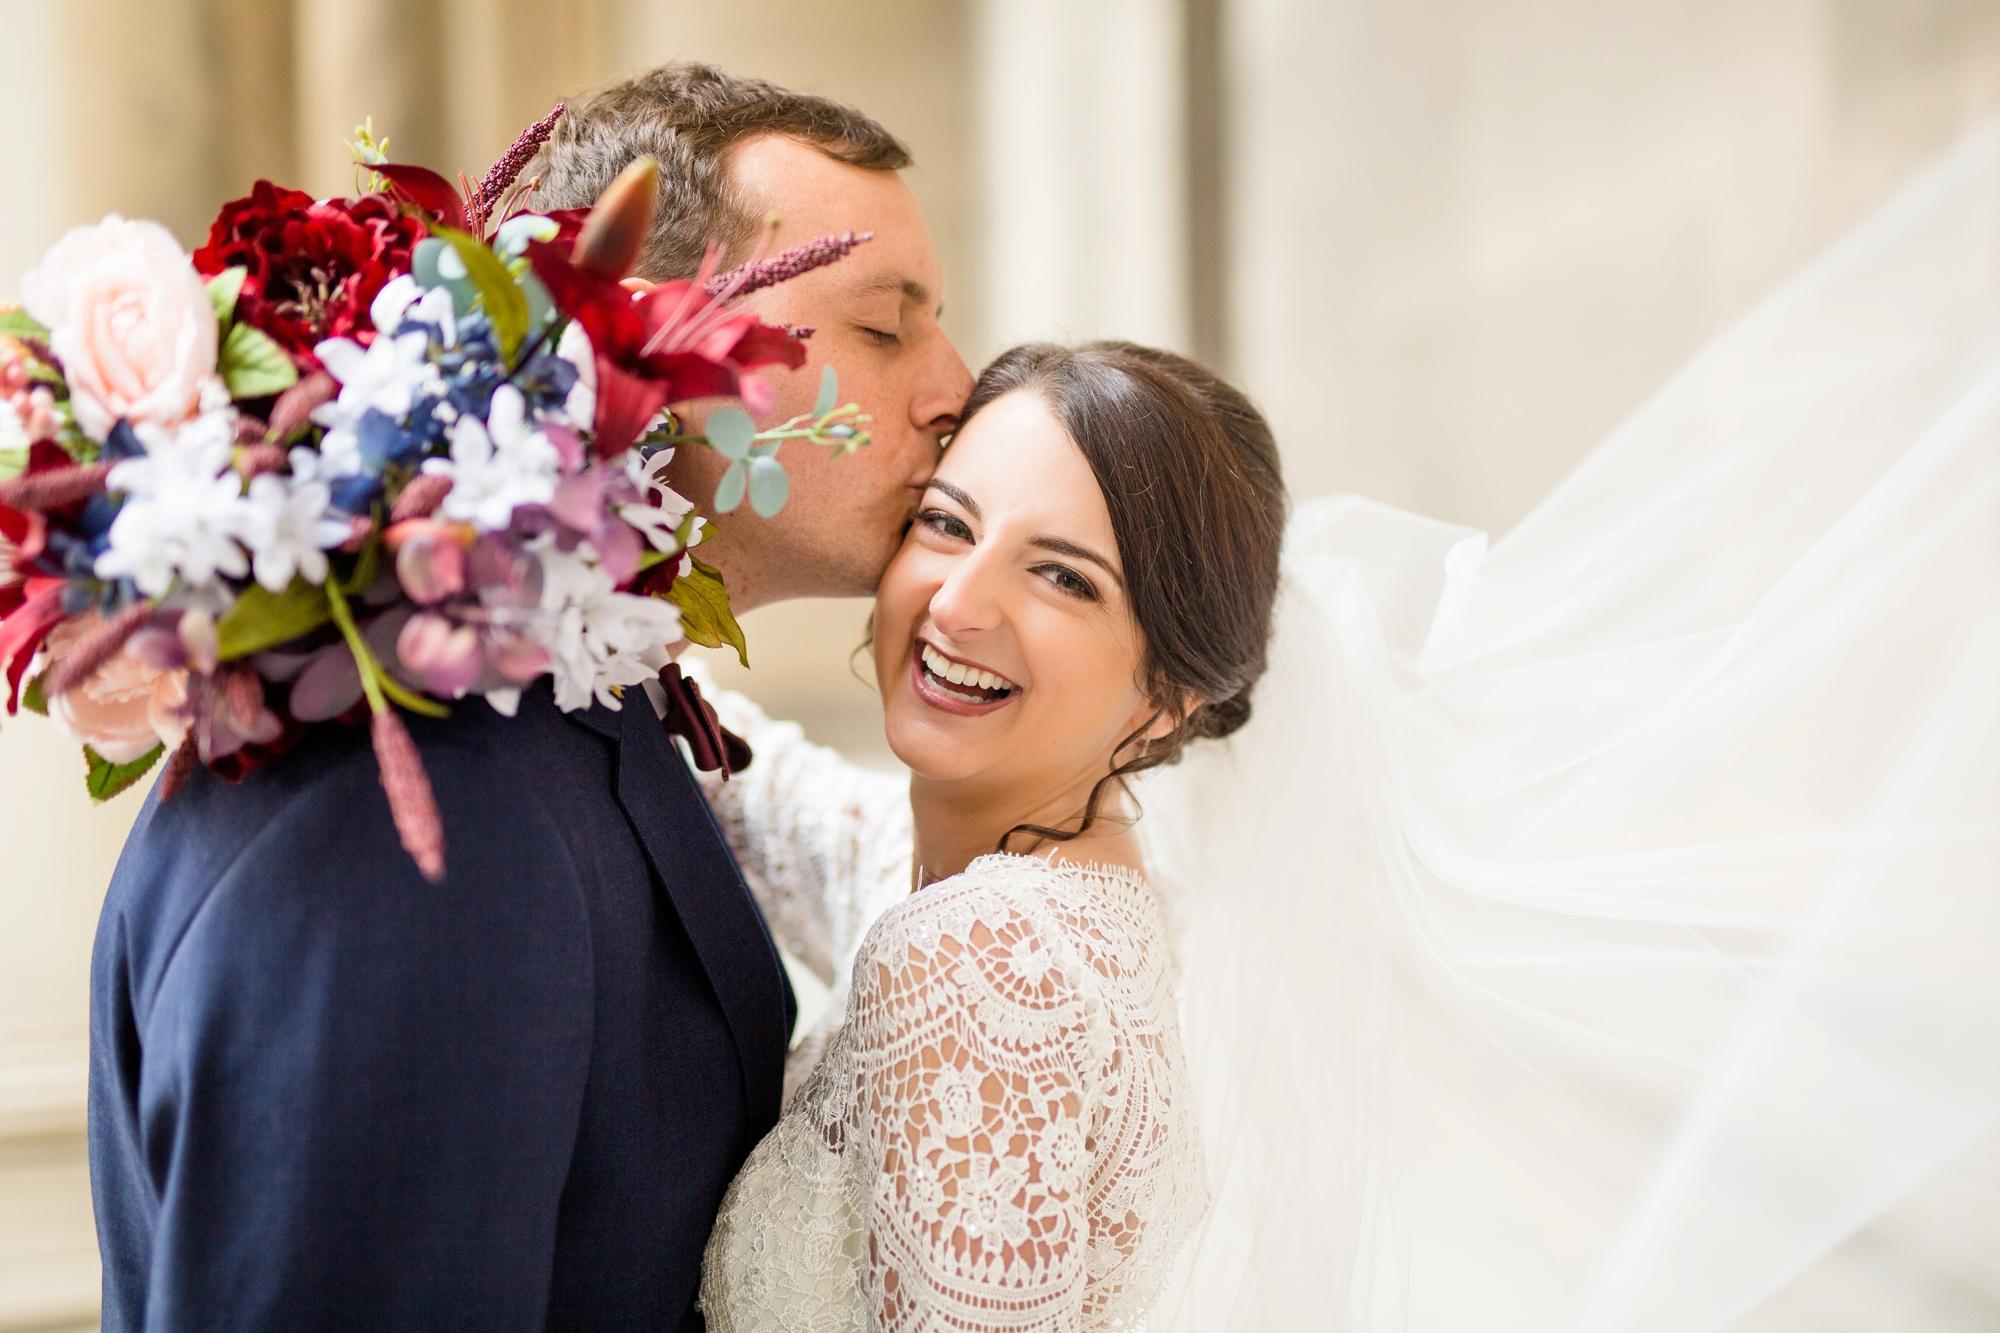 pittsburgh wedding photographer, pittsburgh wedding venues, pittsburgh wedding photos, morning glory inn wedding photos